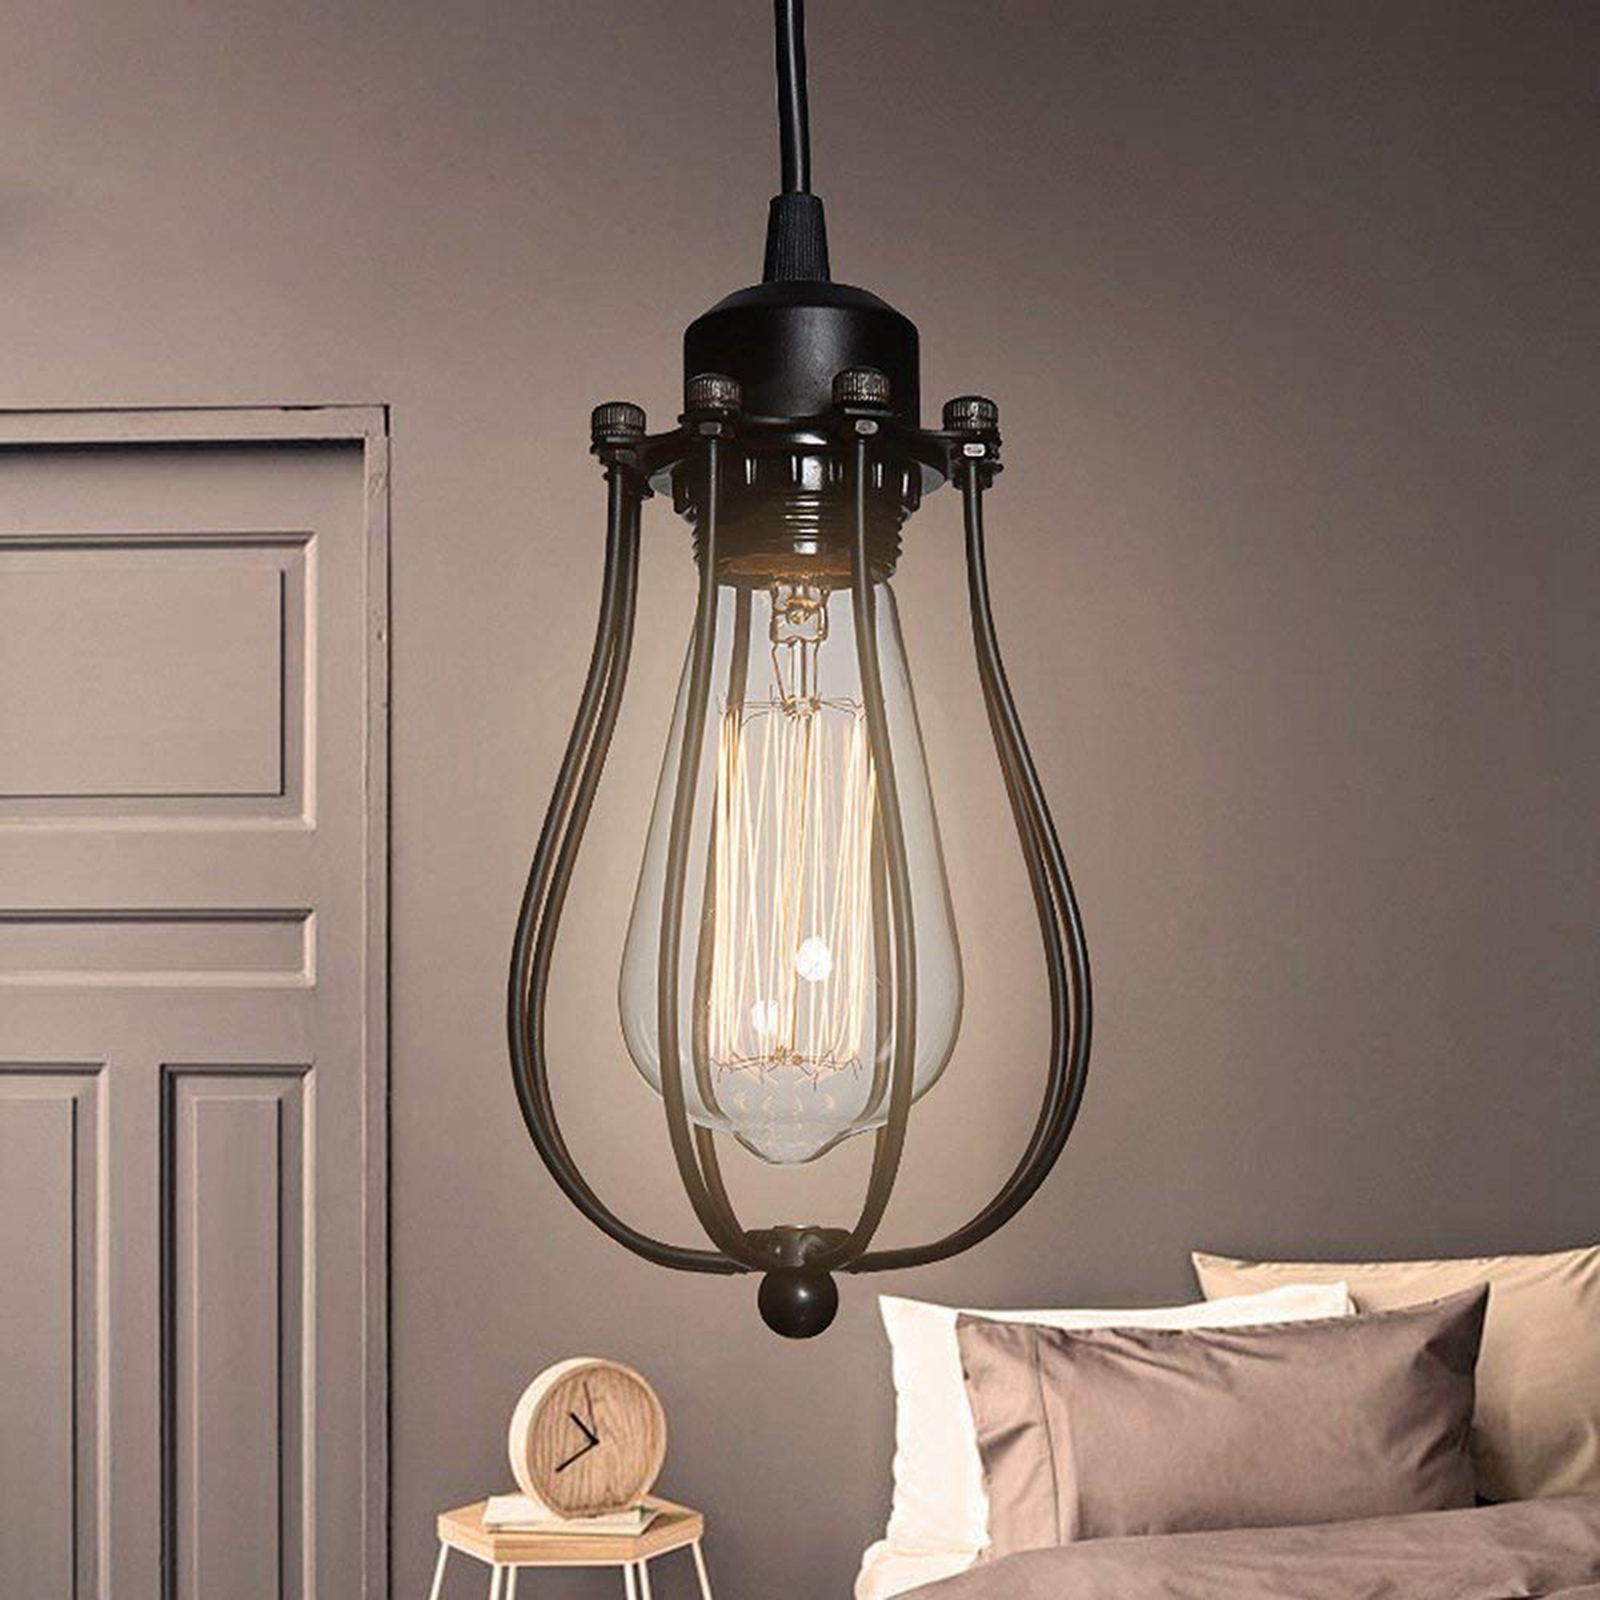 teto, pingente e lâmpada do vintage tons